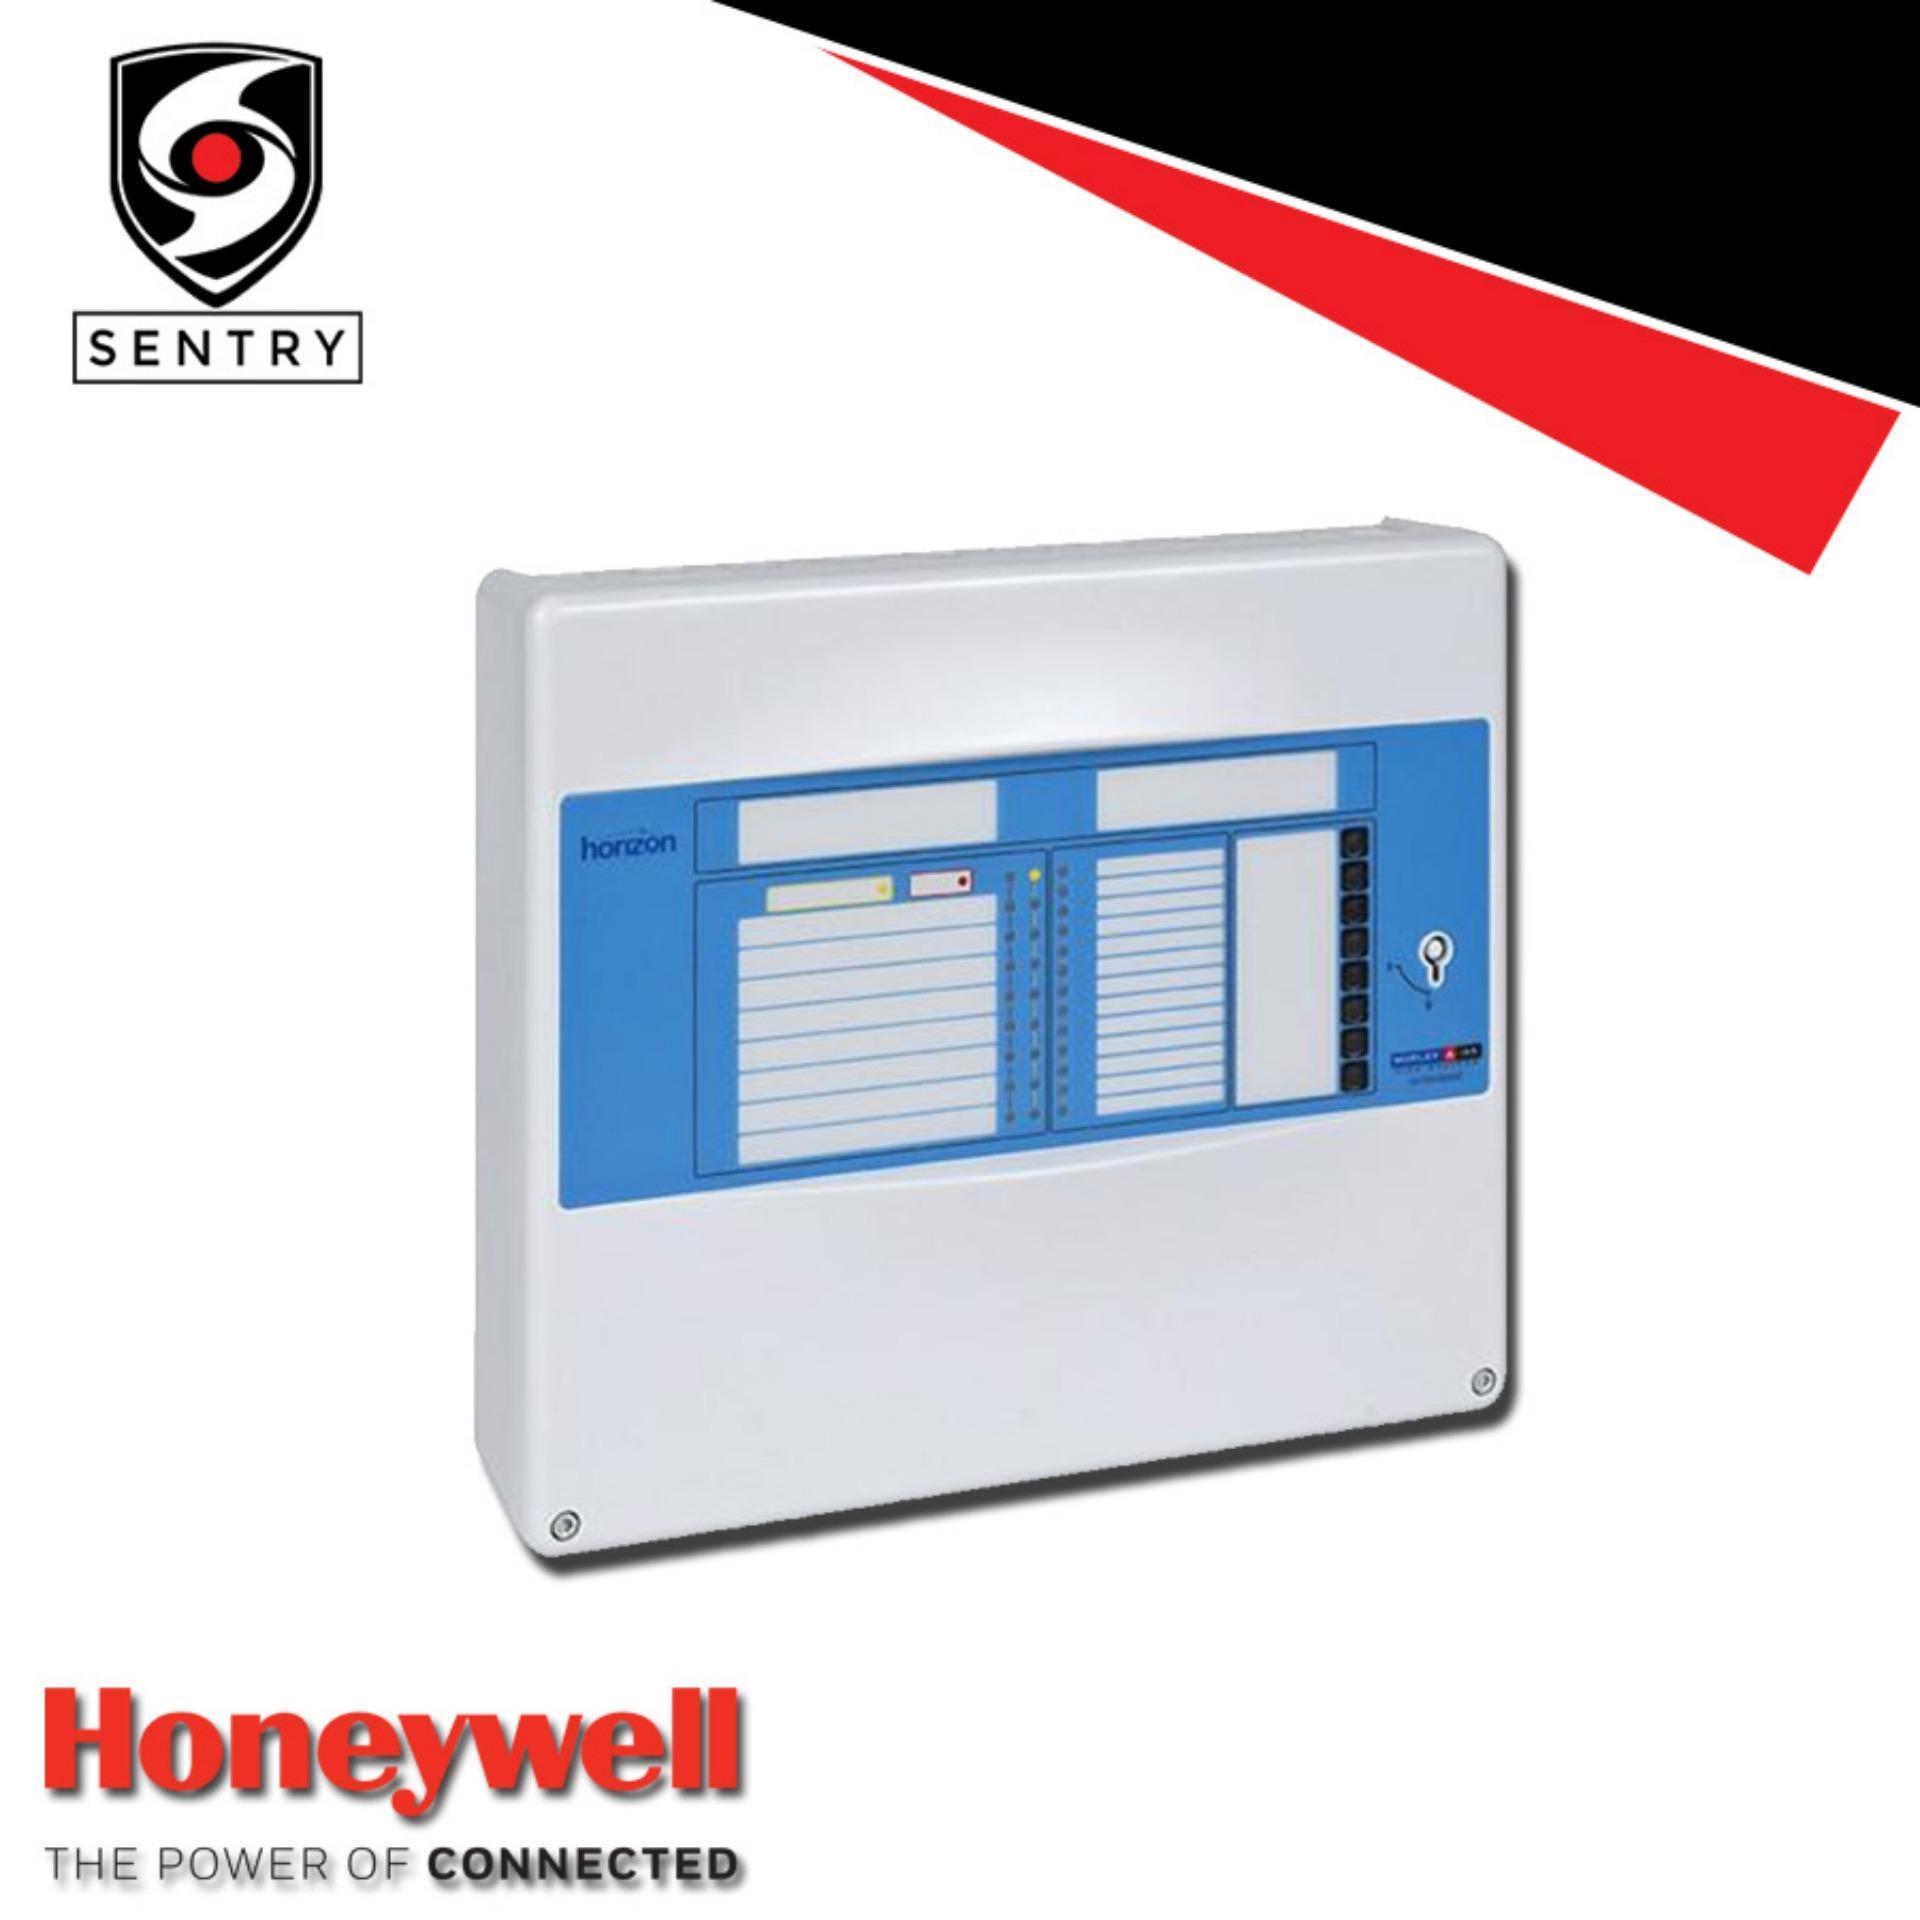 HONEYWELL HRZ-4e, 4 zone conventional fire alarm control panel